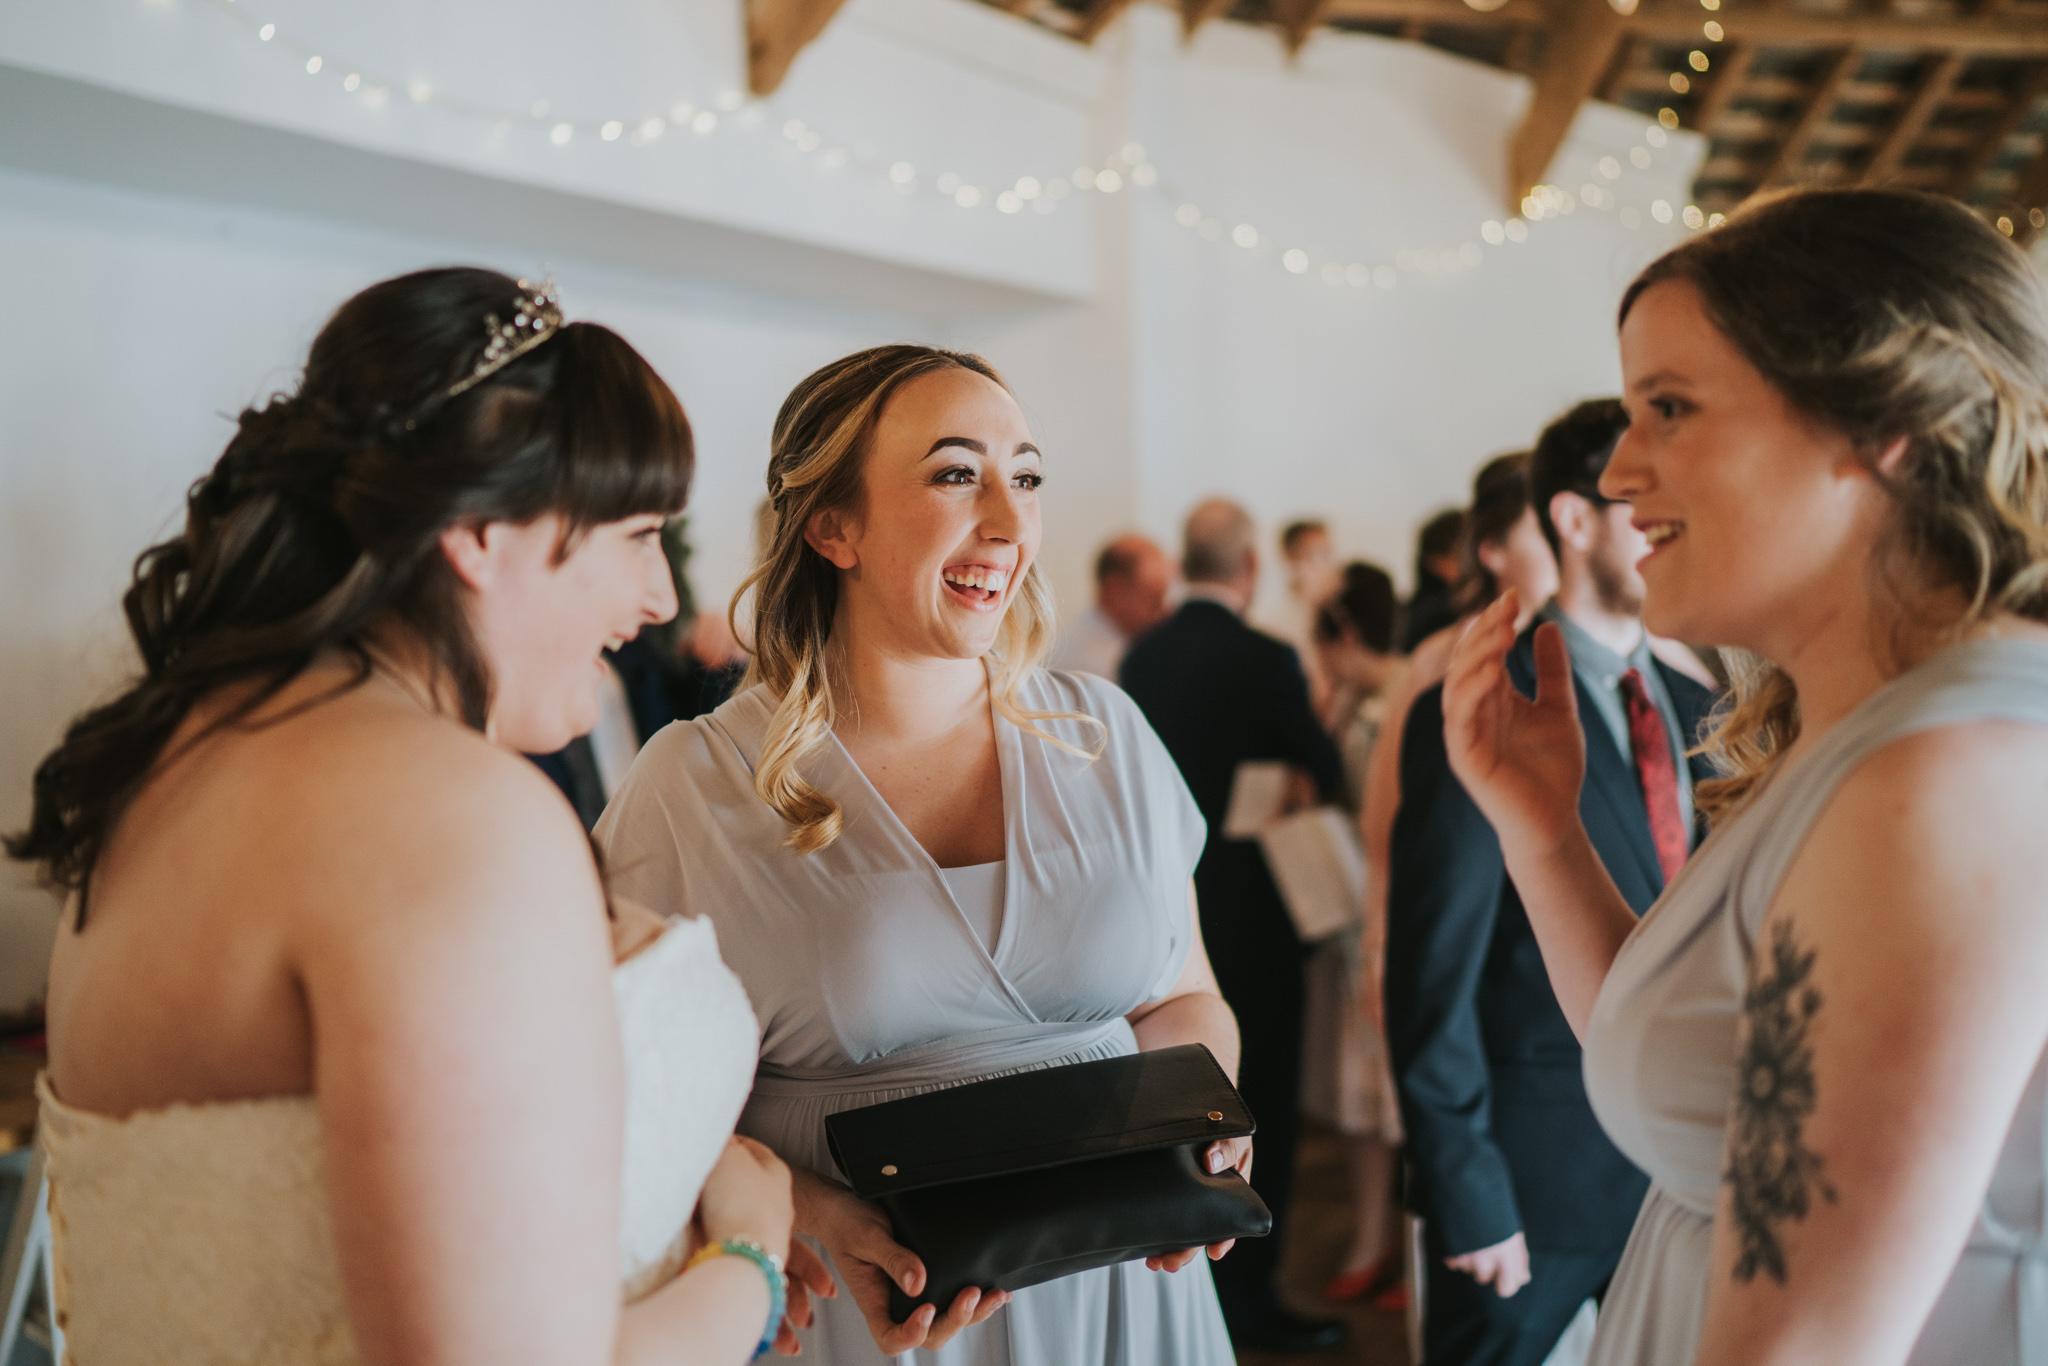 grace-sam-old-barn-clovelly-devon-wedding-photographer-grace-elizabeth-essex-suffolk-norfolk-wedding-photographer (72 of 132).jpg